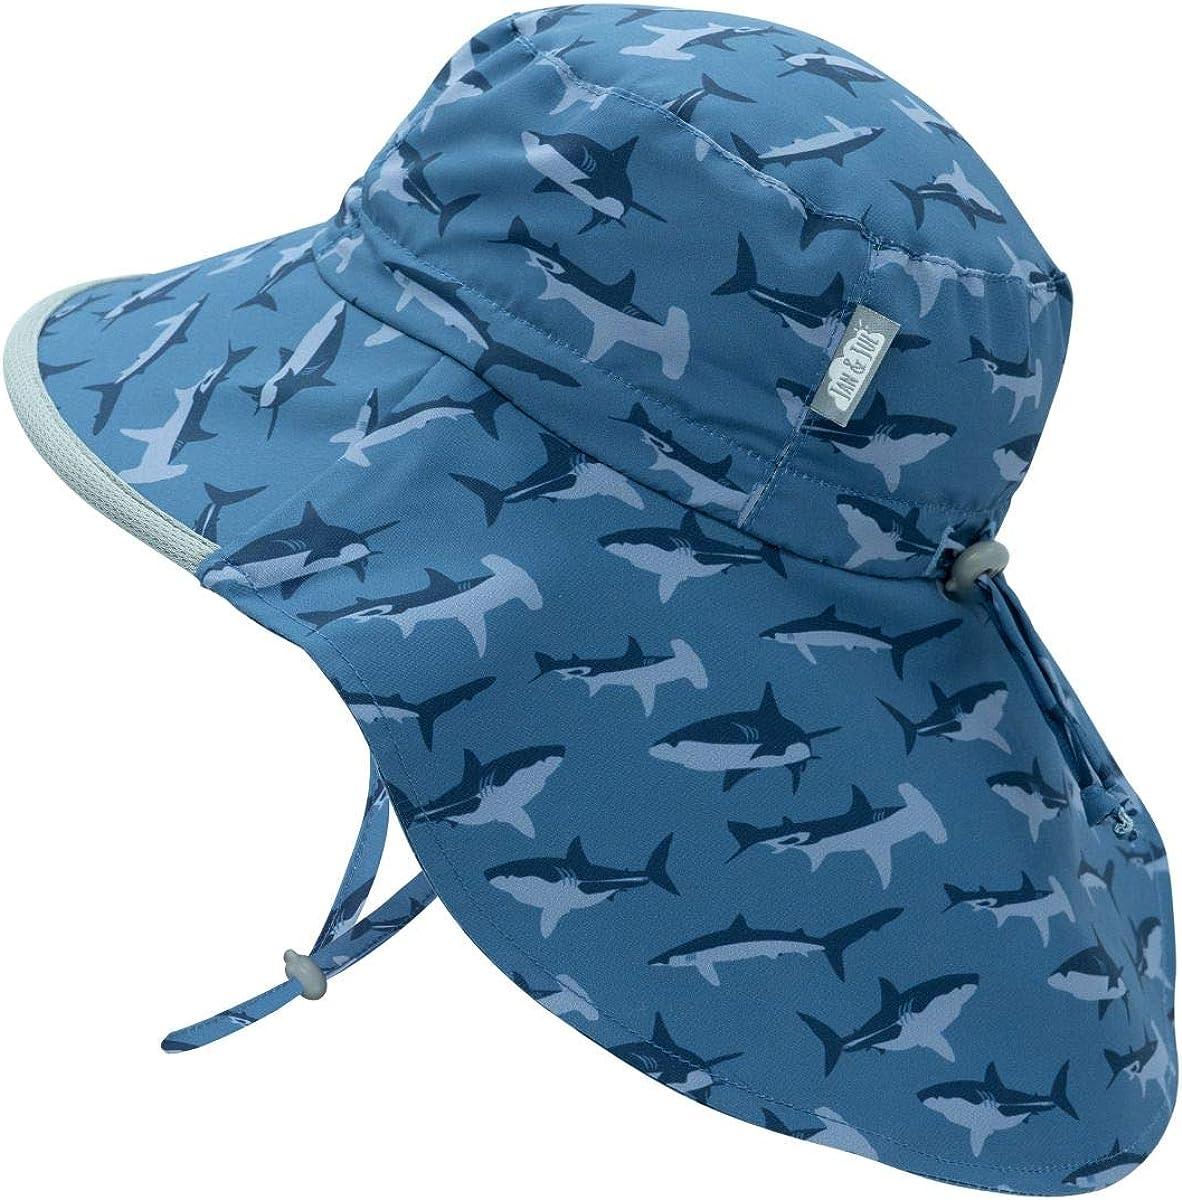 JAN & JUL Kids' GRO-with-Me Aqua-Dry Adventure Hat   50+ UPF Wide Brim Water-Repellent Sunhat